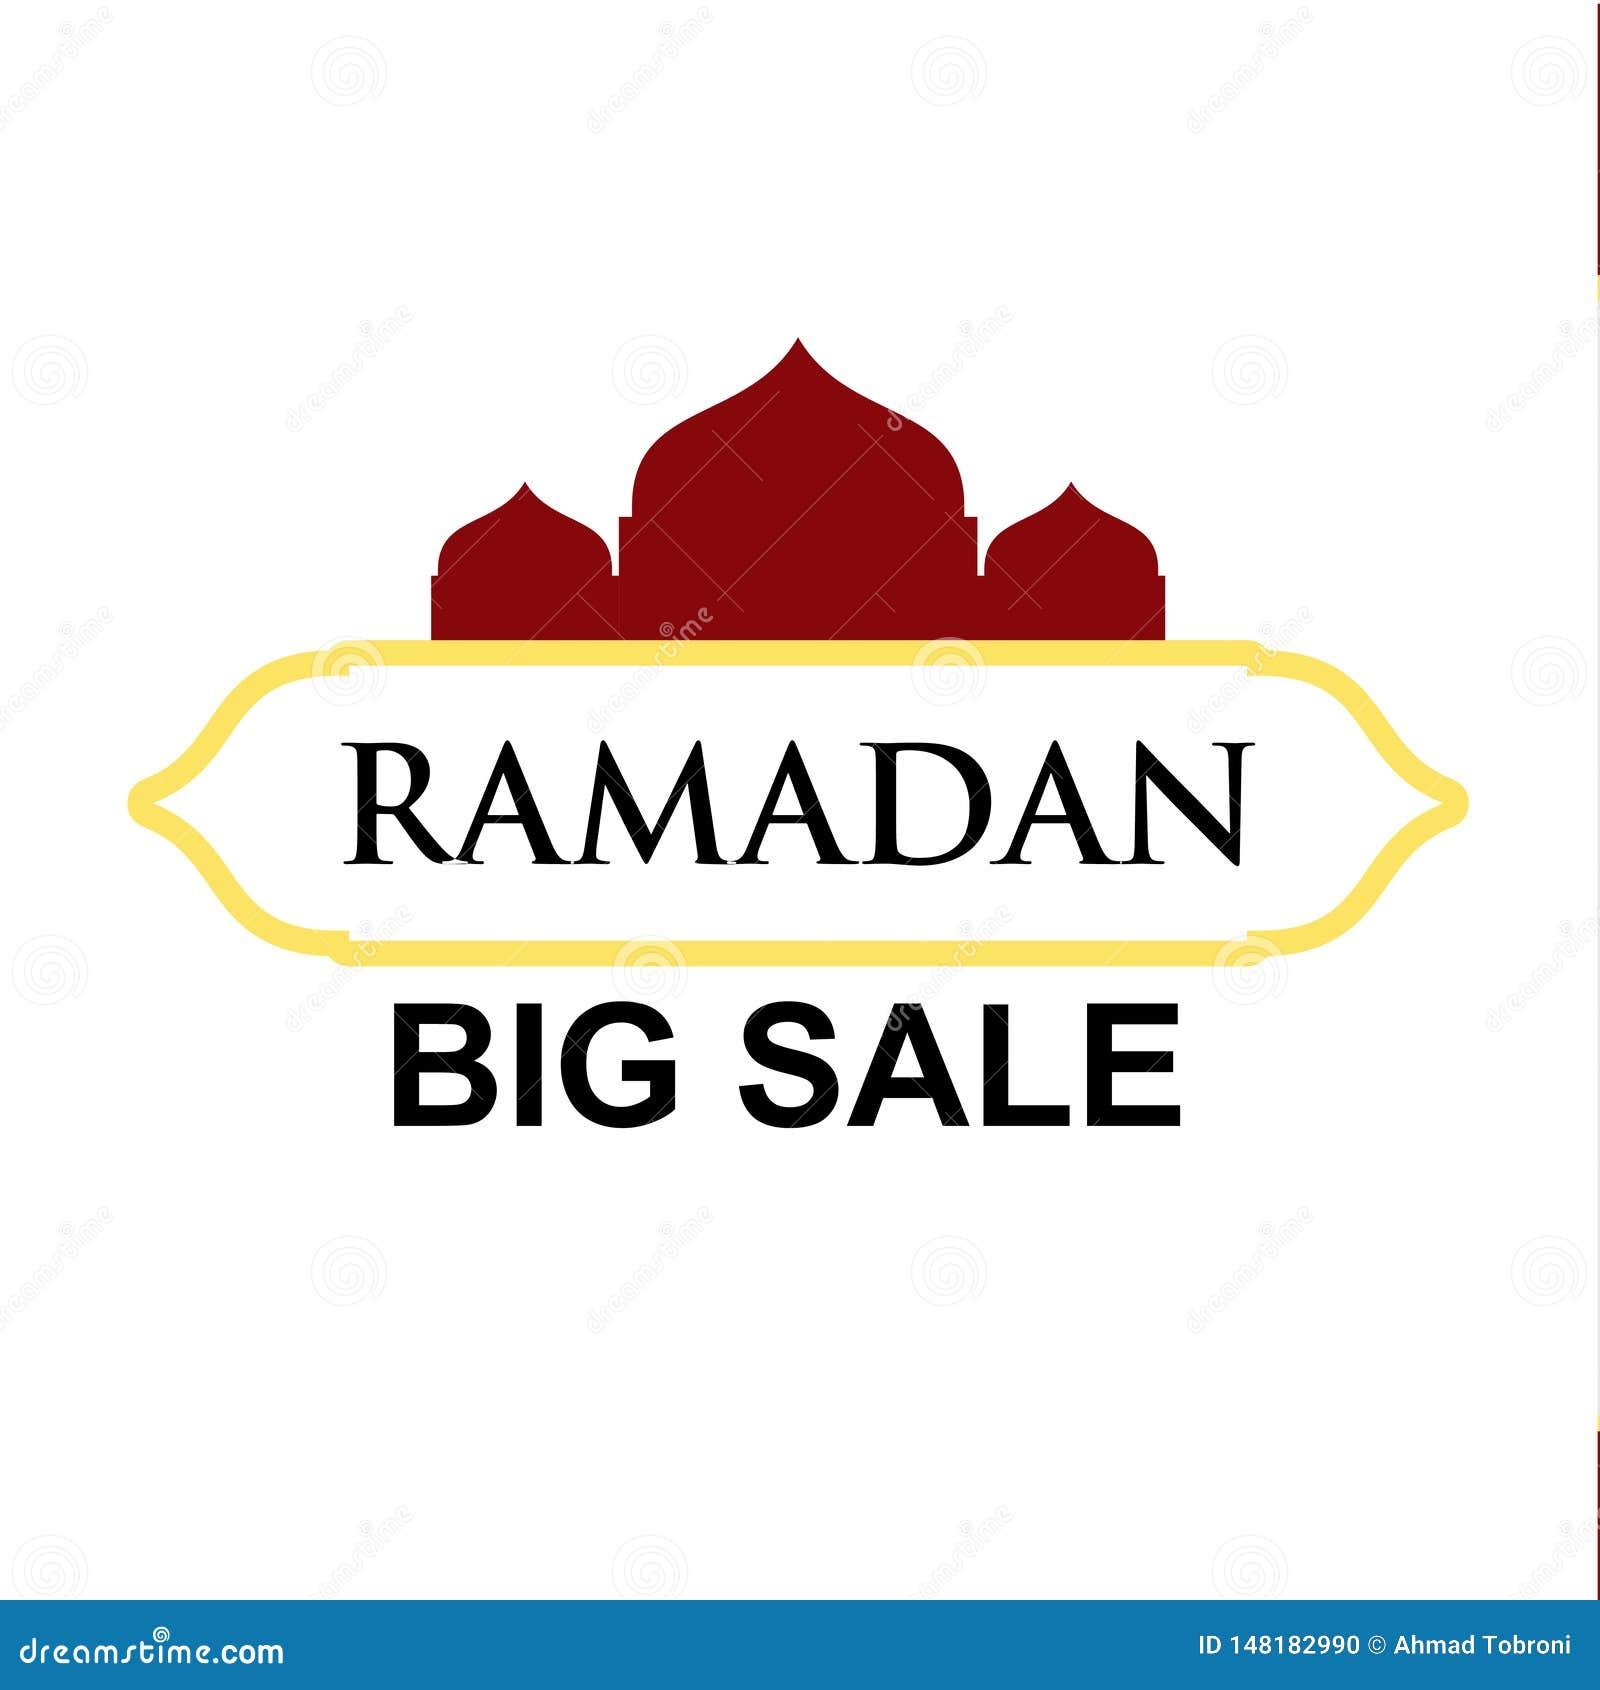 Ramadan Big Sale Vector Template-Entwurfs-Illustration